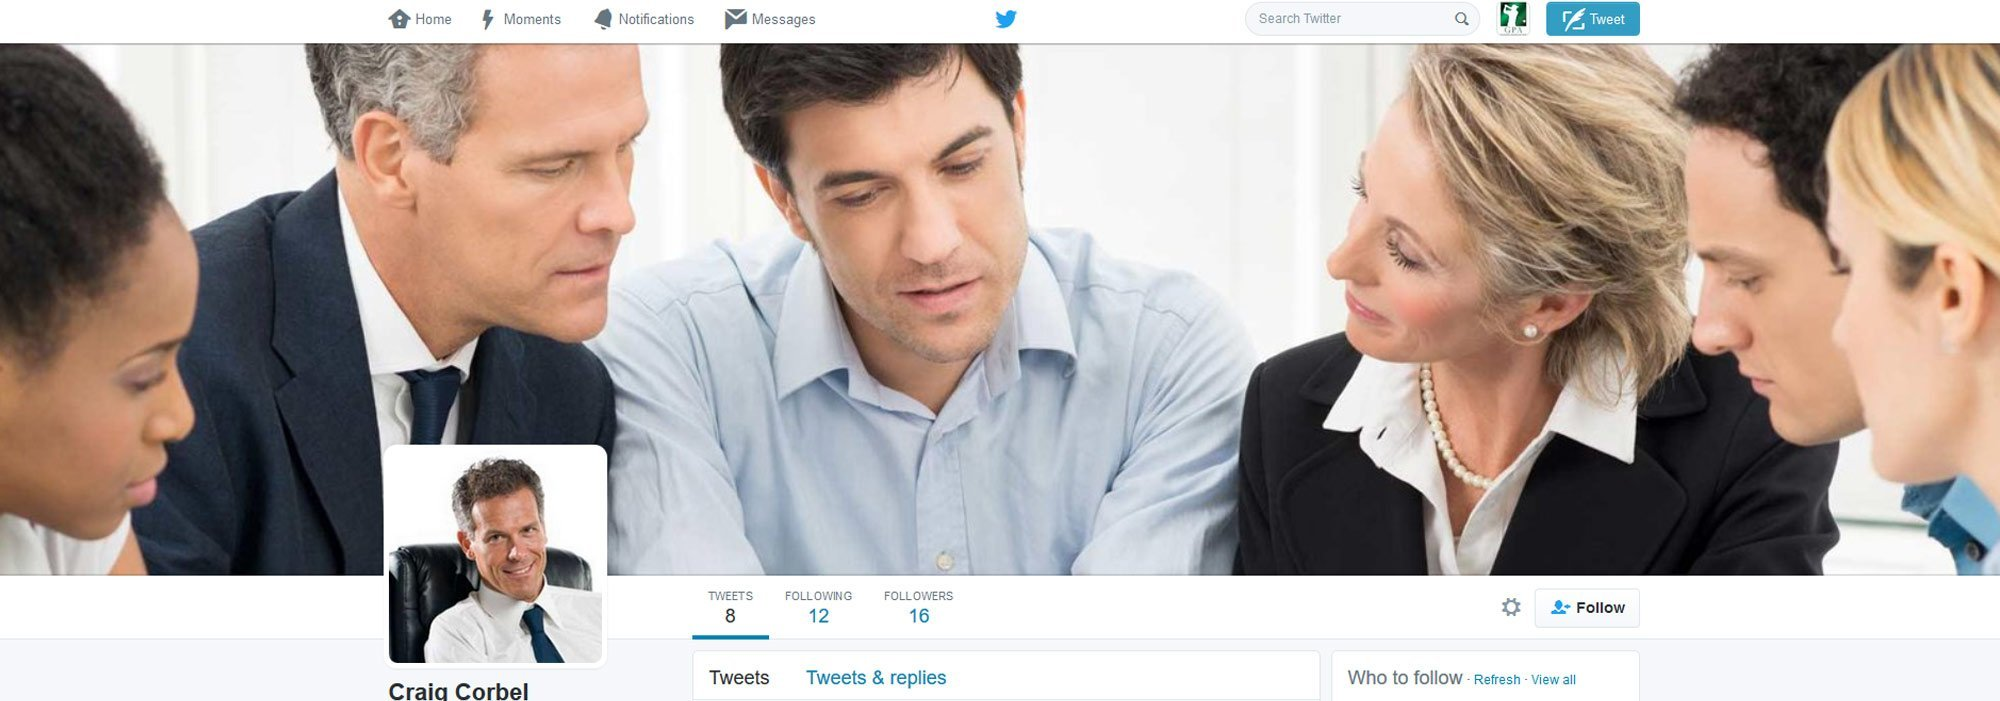 Twitter Marketing Agency Solution Web Designs